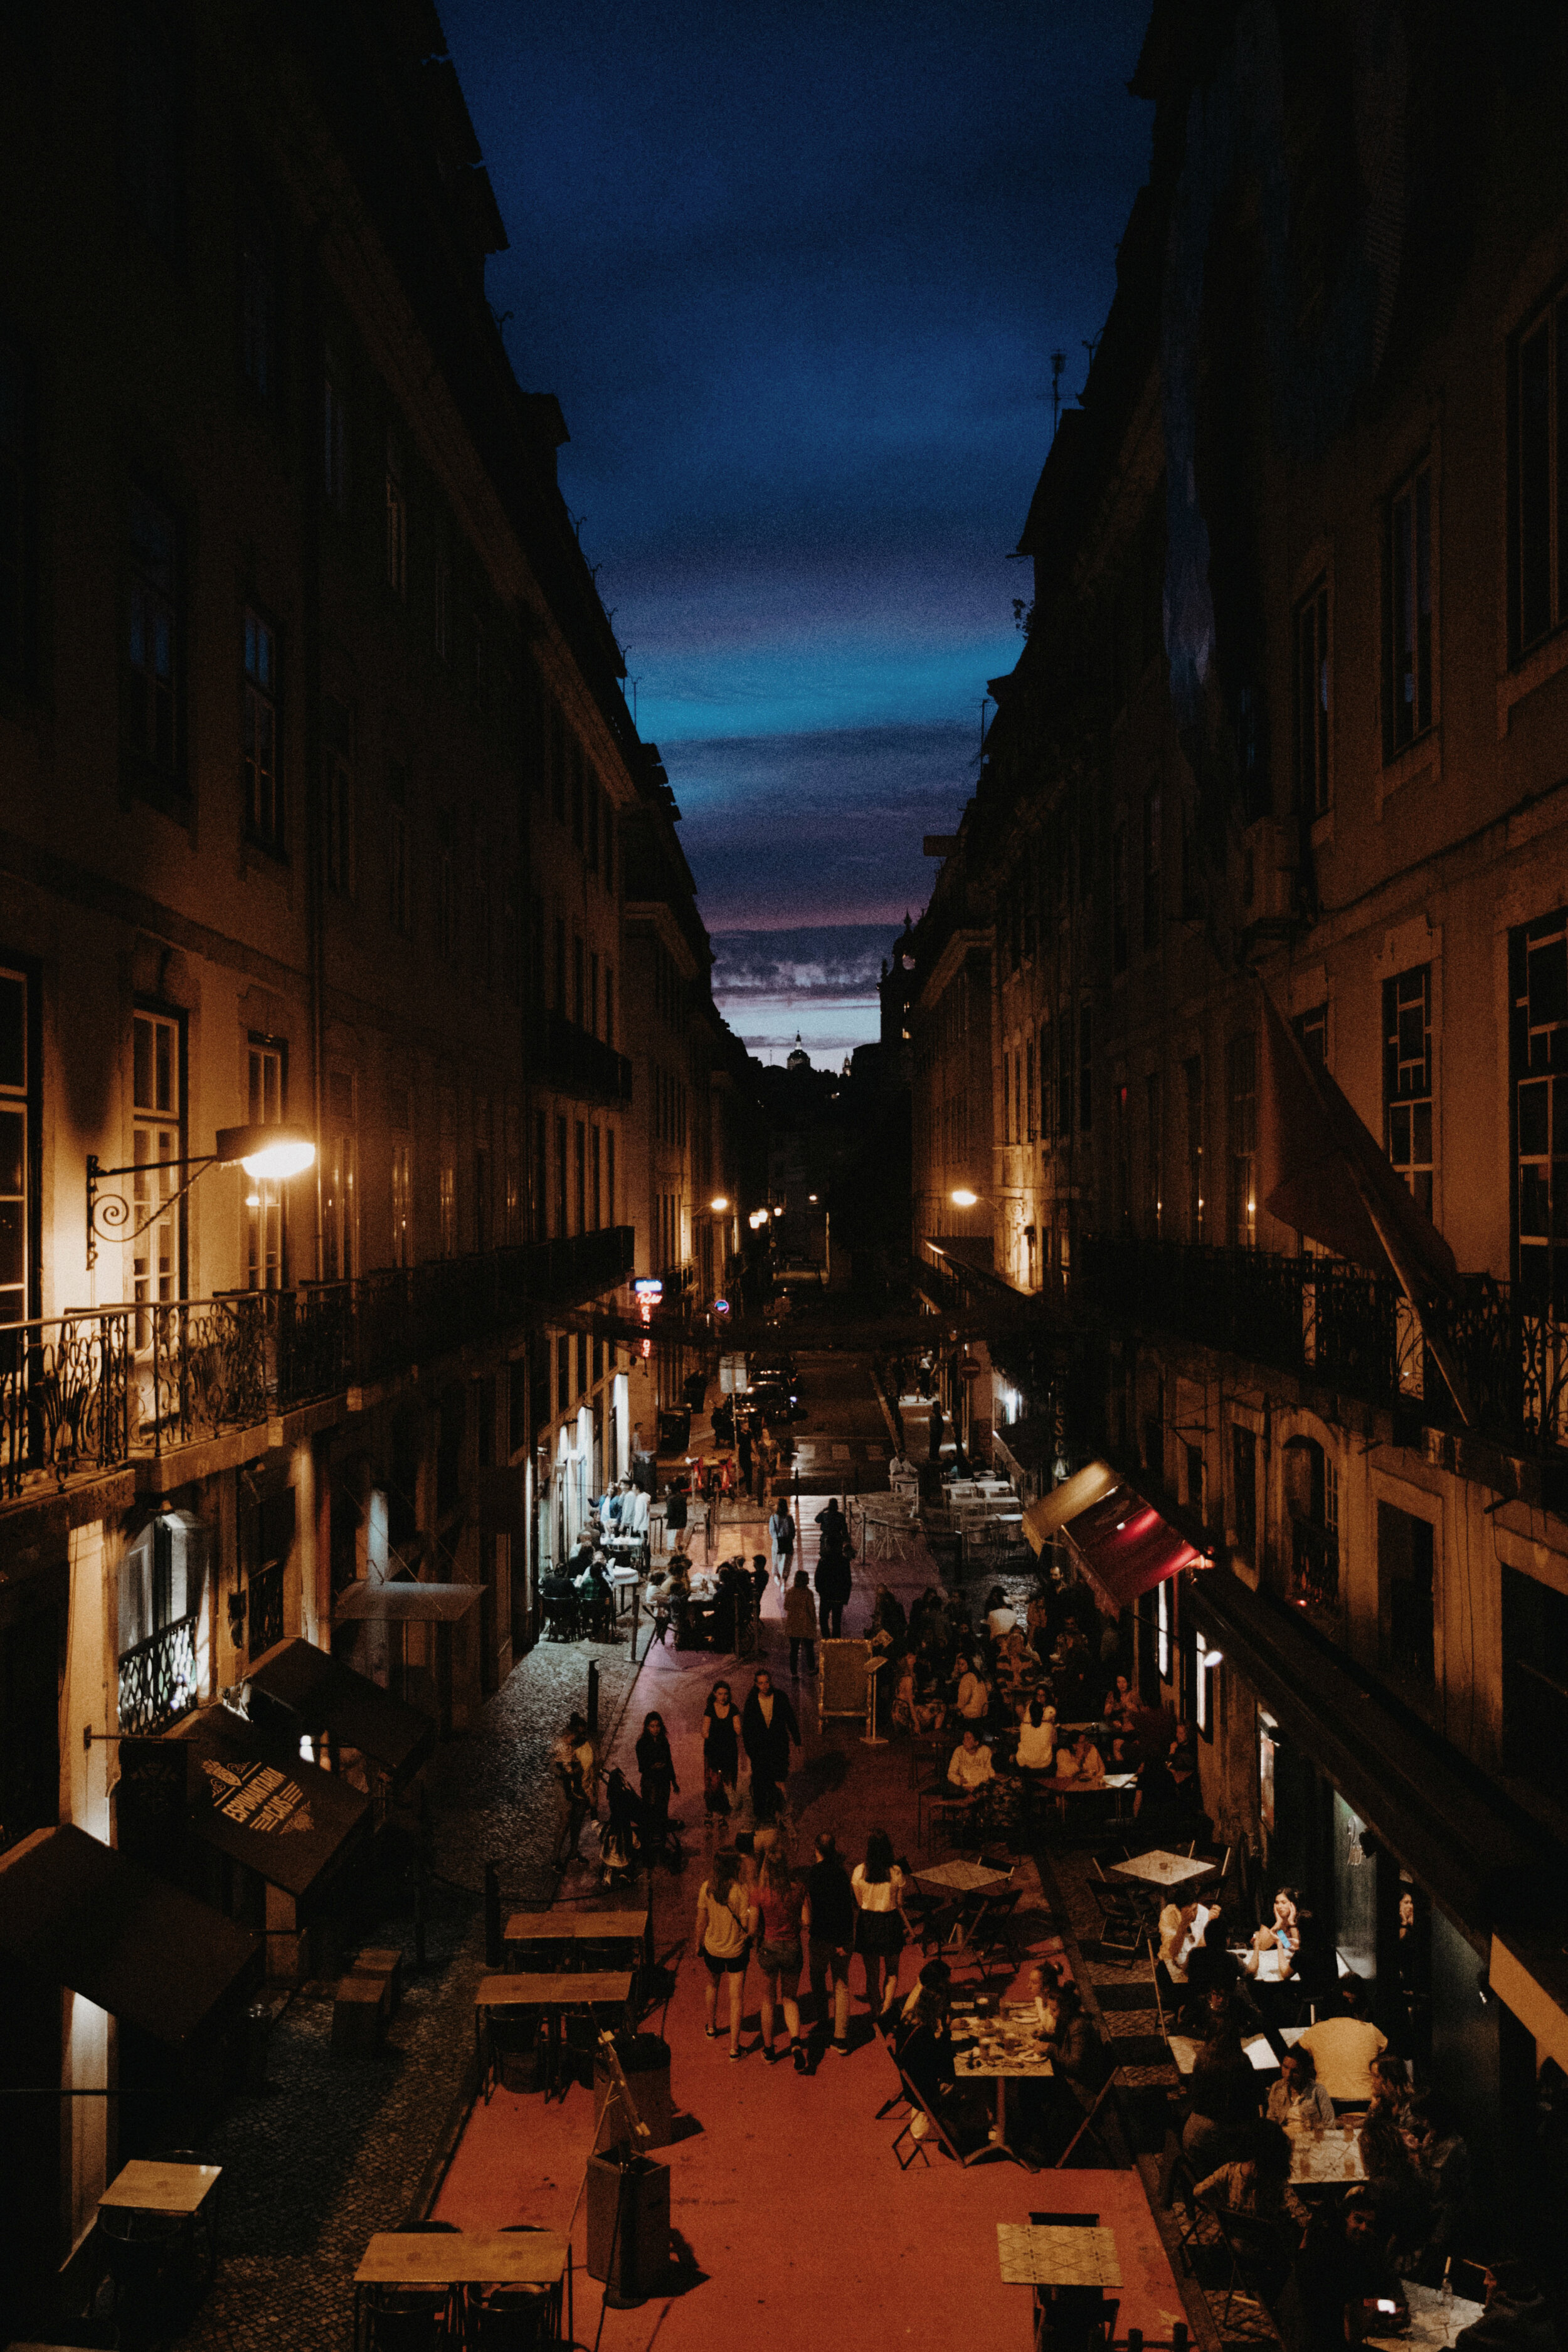 Walking through Lisbon at dusk